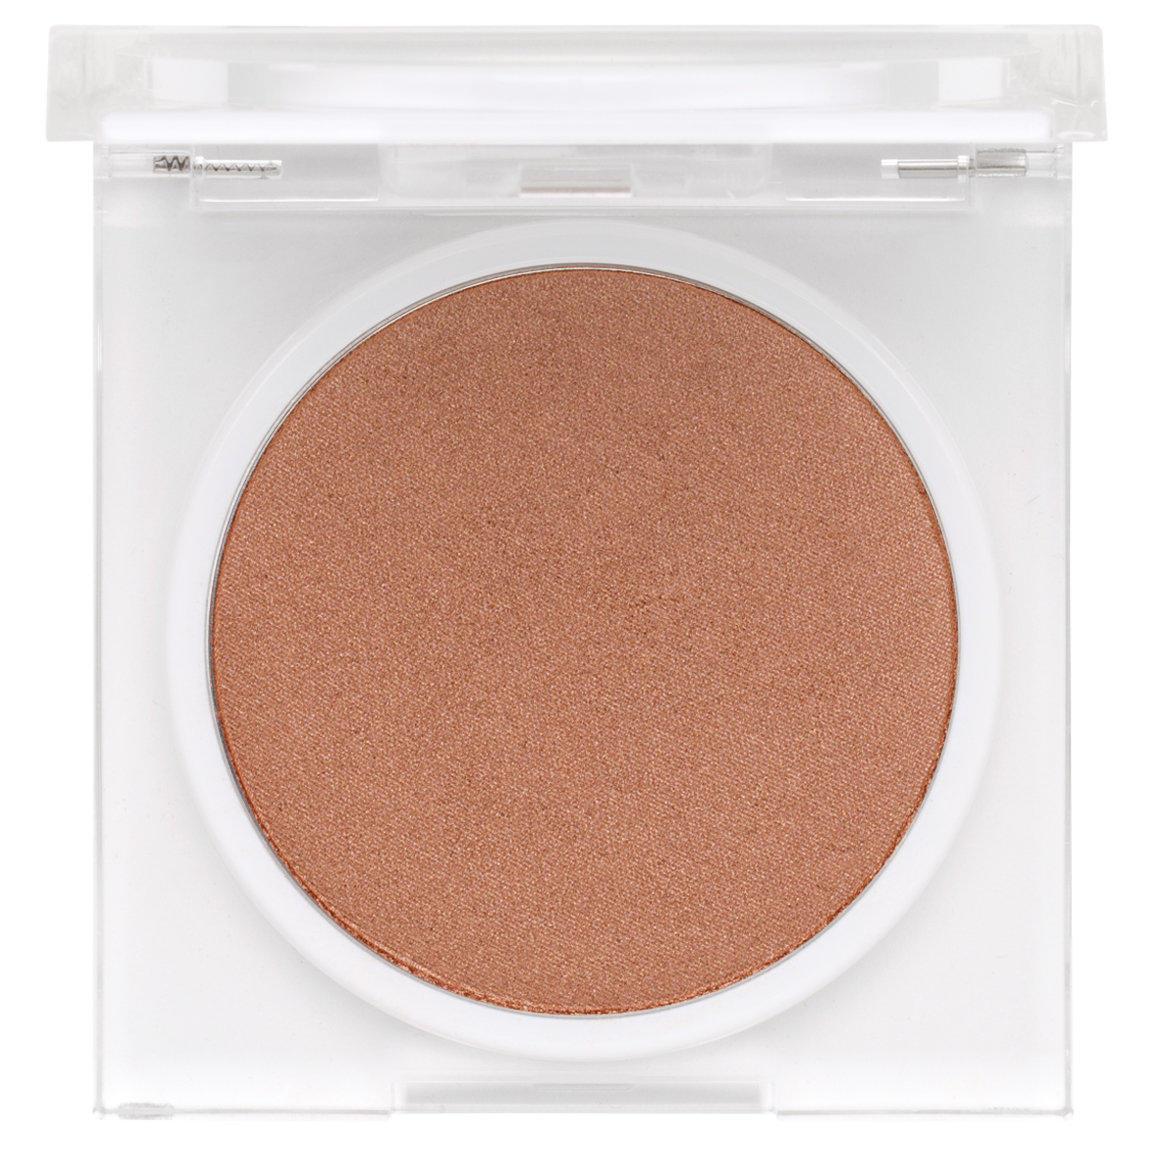 RMS Beauty Luminizing Powder Scarlett Peach